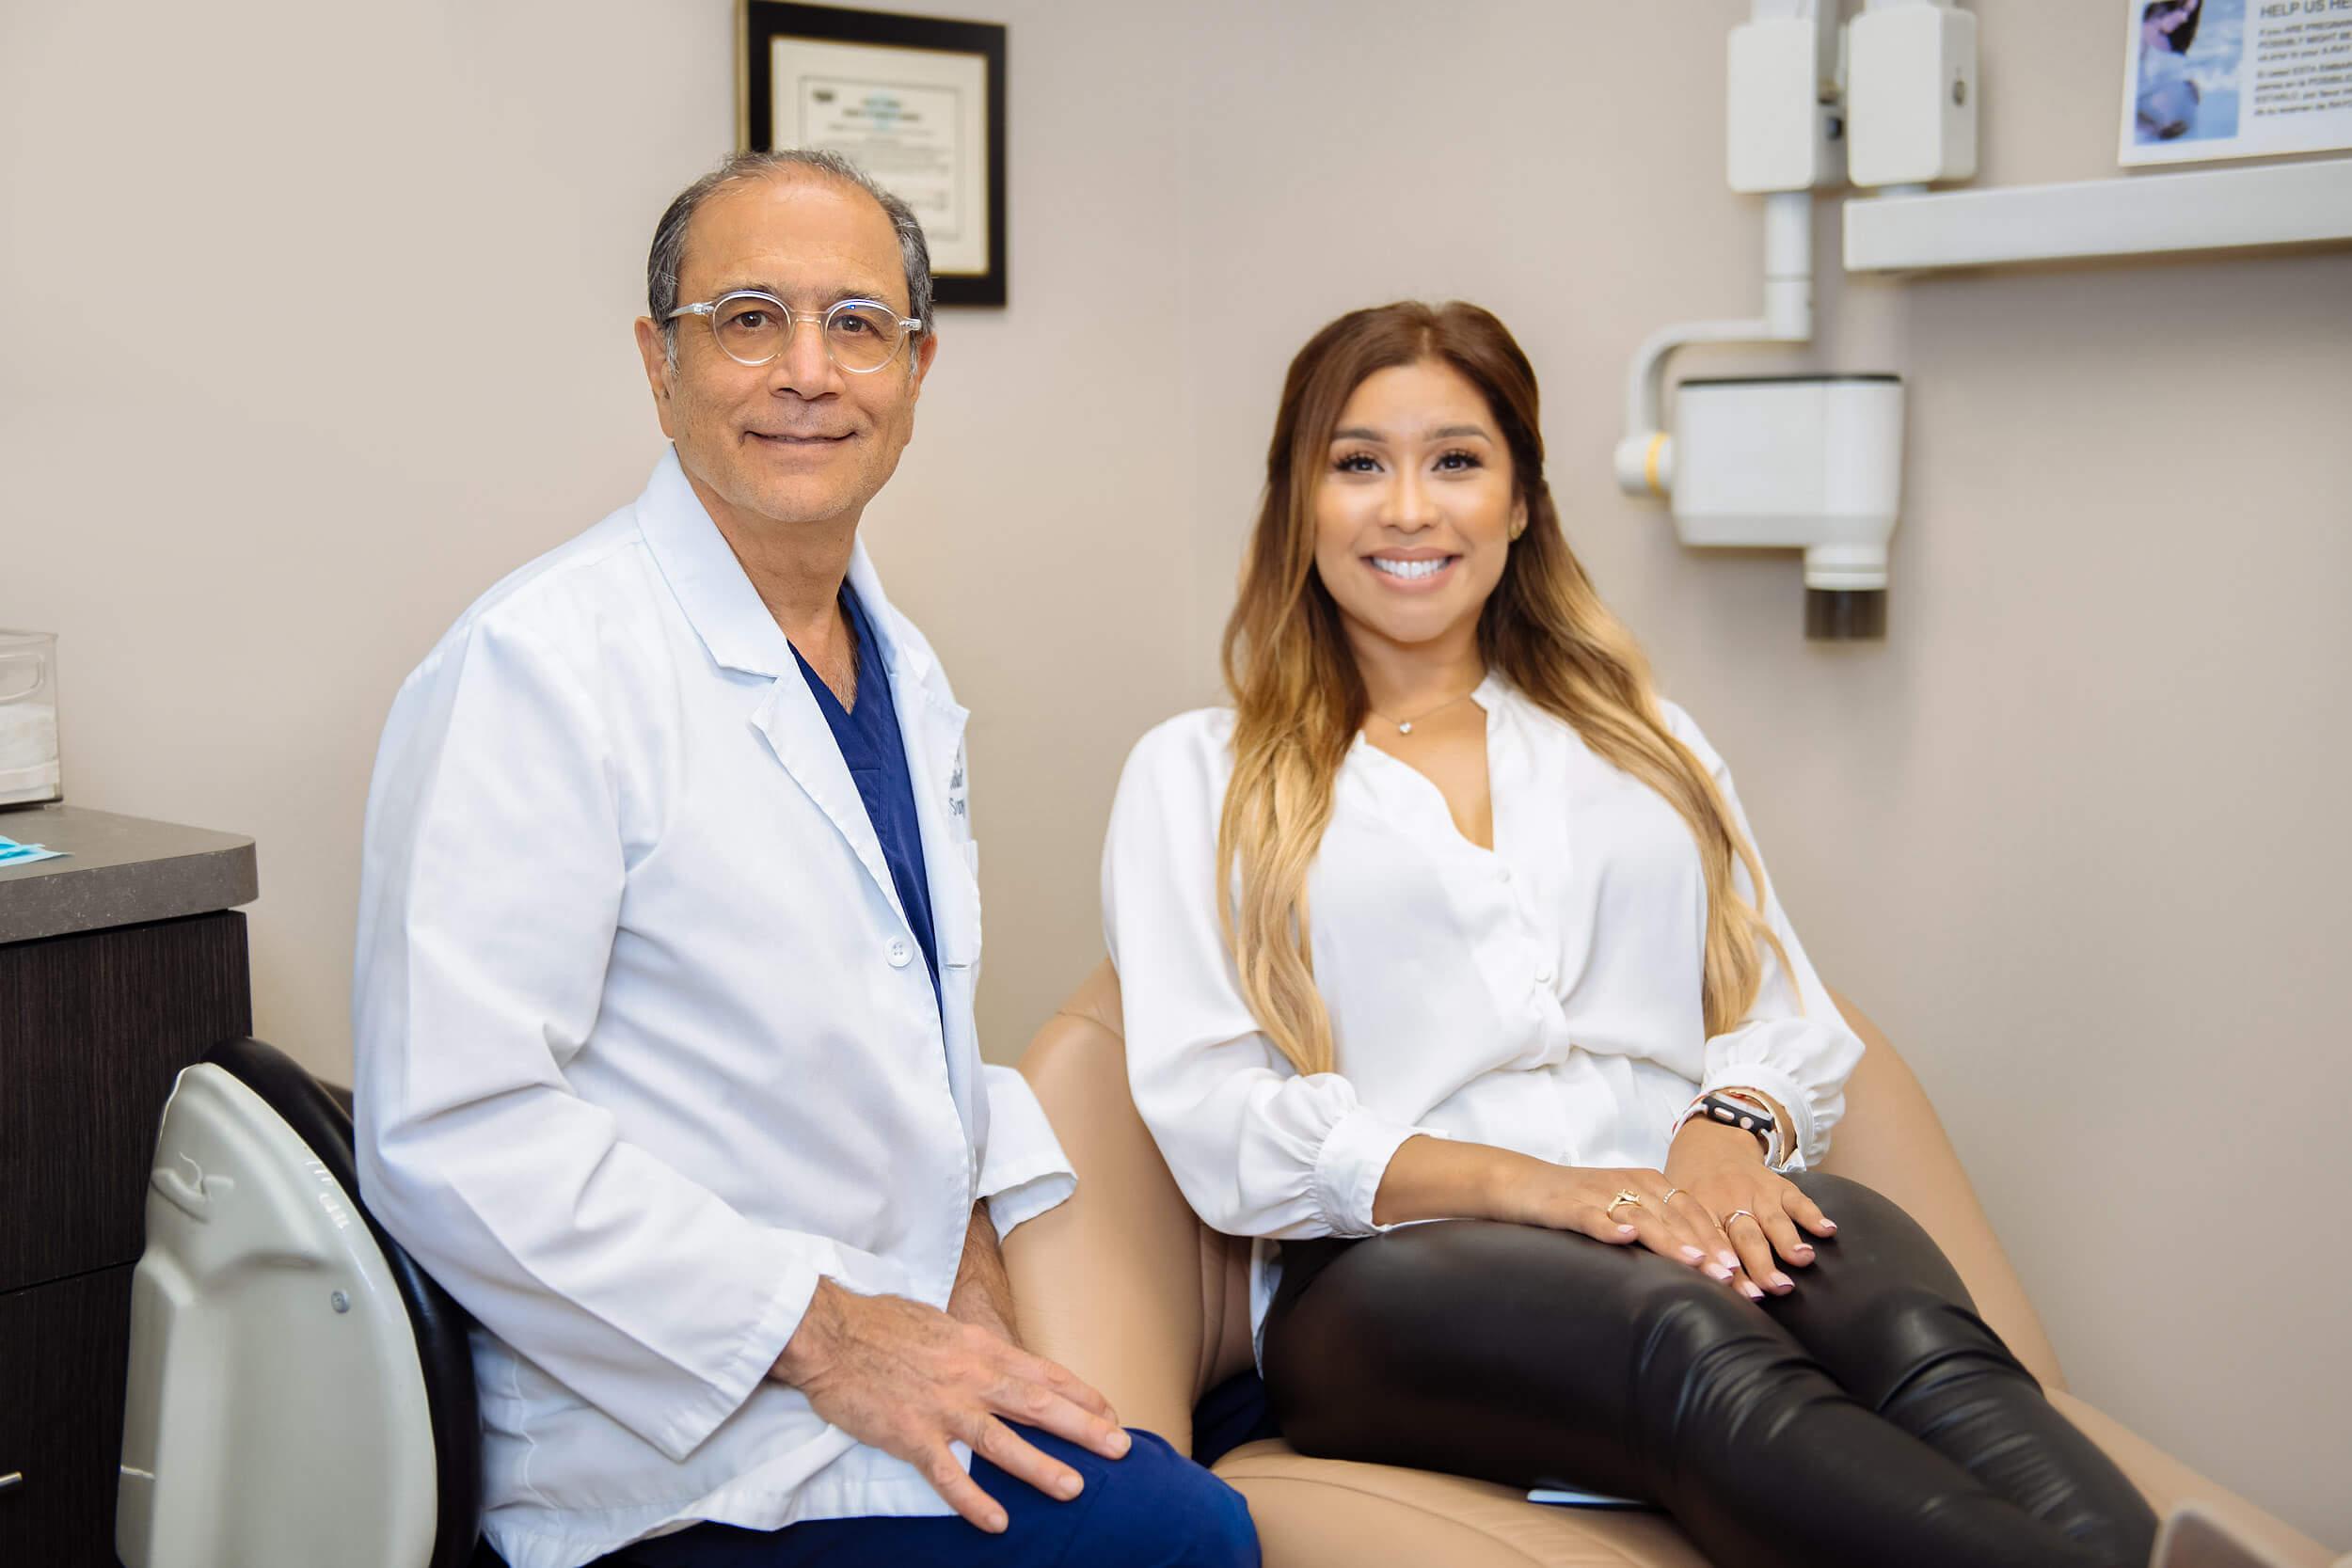 Dr. Shaun Daneshgar sitting with patient